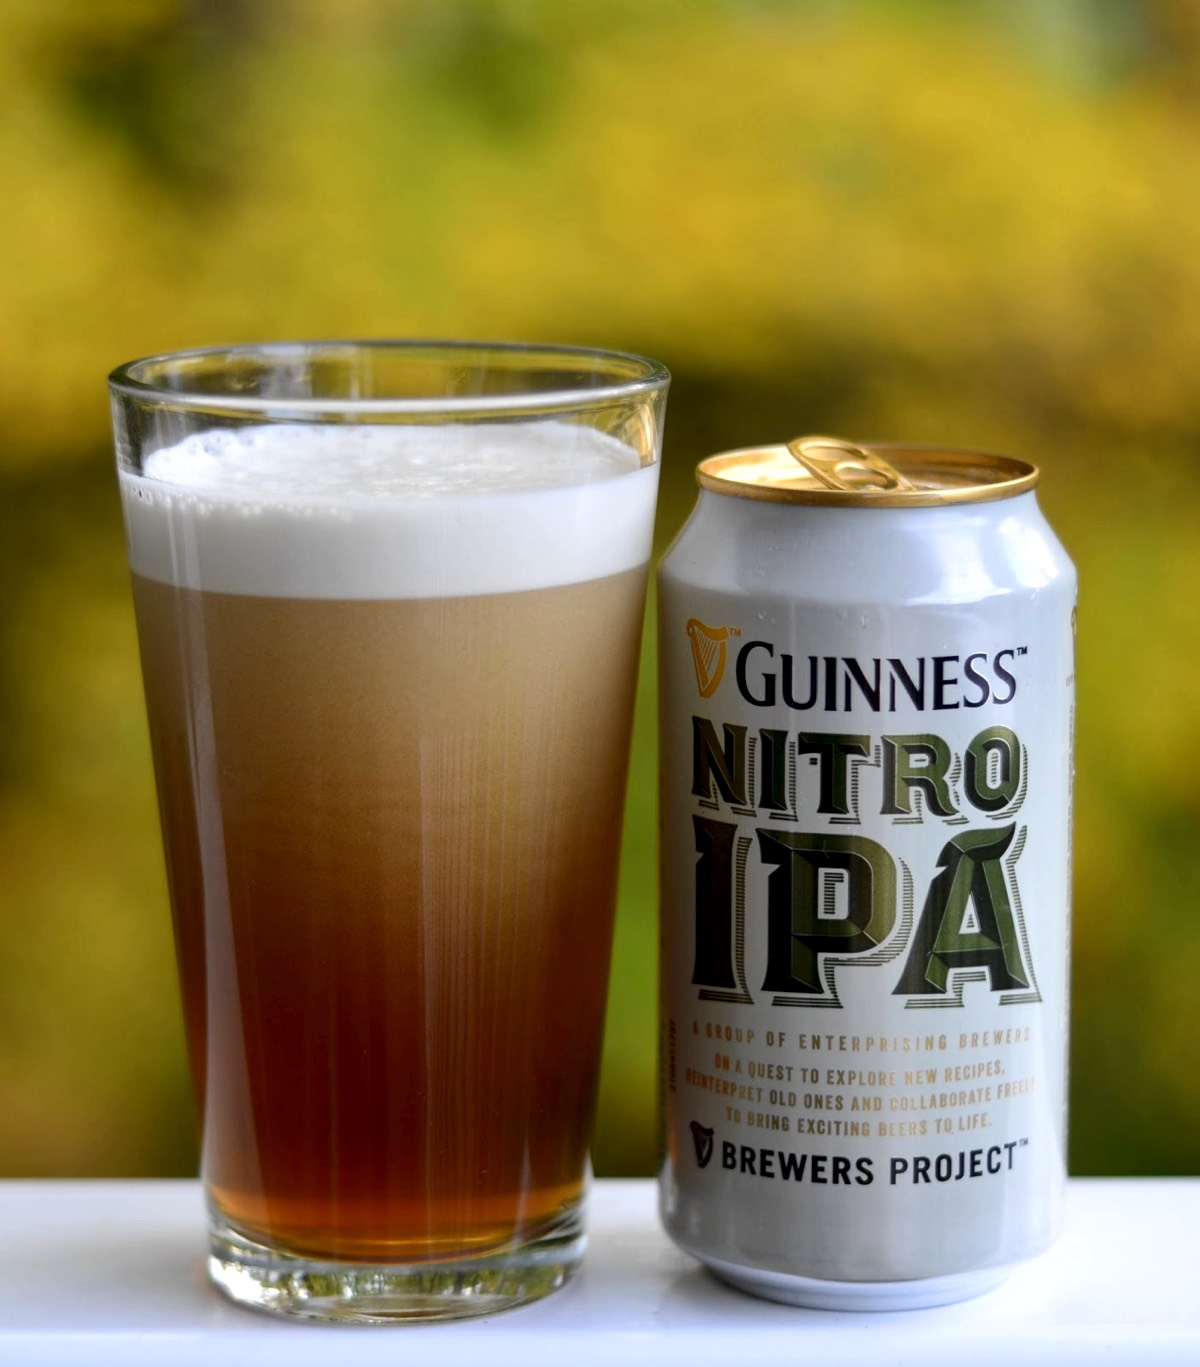 Guinness lanza una IPA nitrogenada